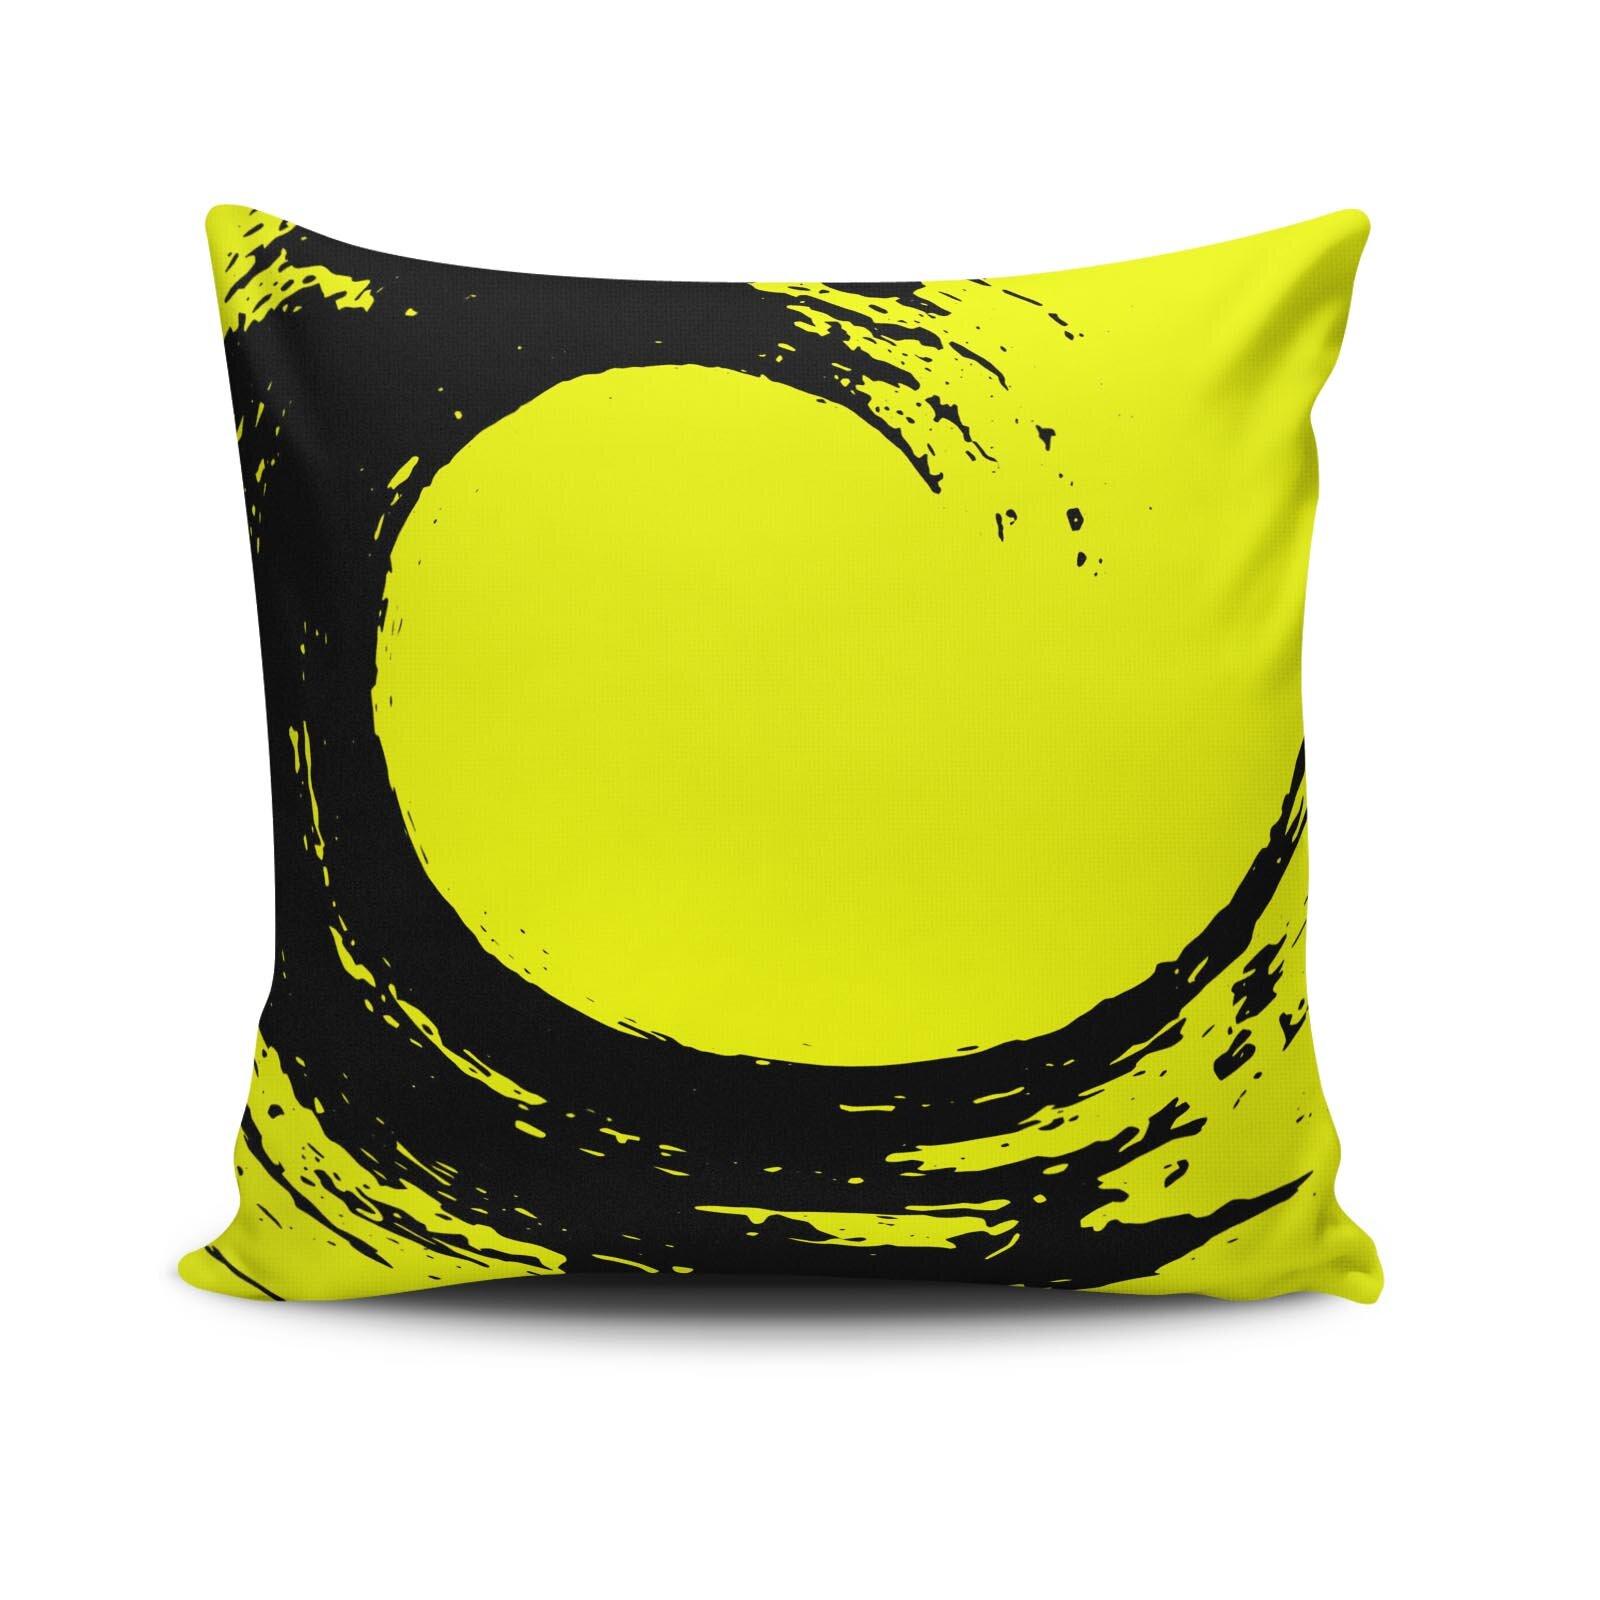 Perna decorativa Cushion Love, Dimensiune: 45 x 45 cm, Material exterior: 50% bumbac / 50% poliester 768CLV0240